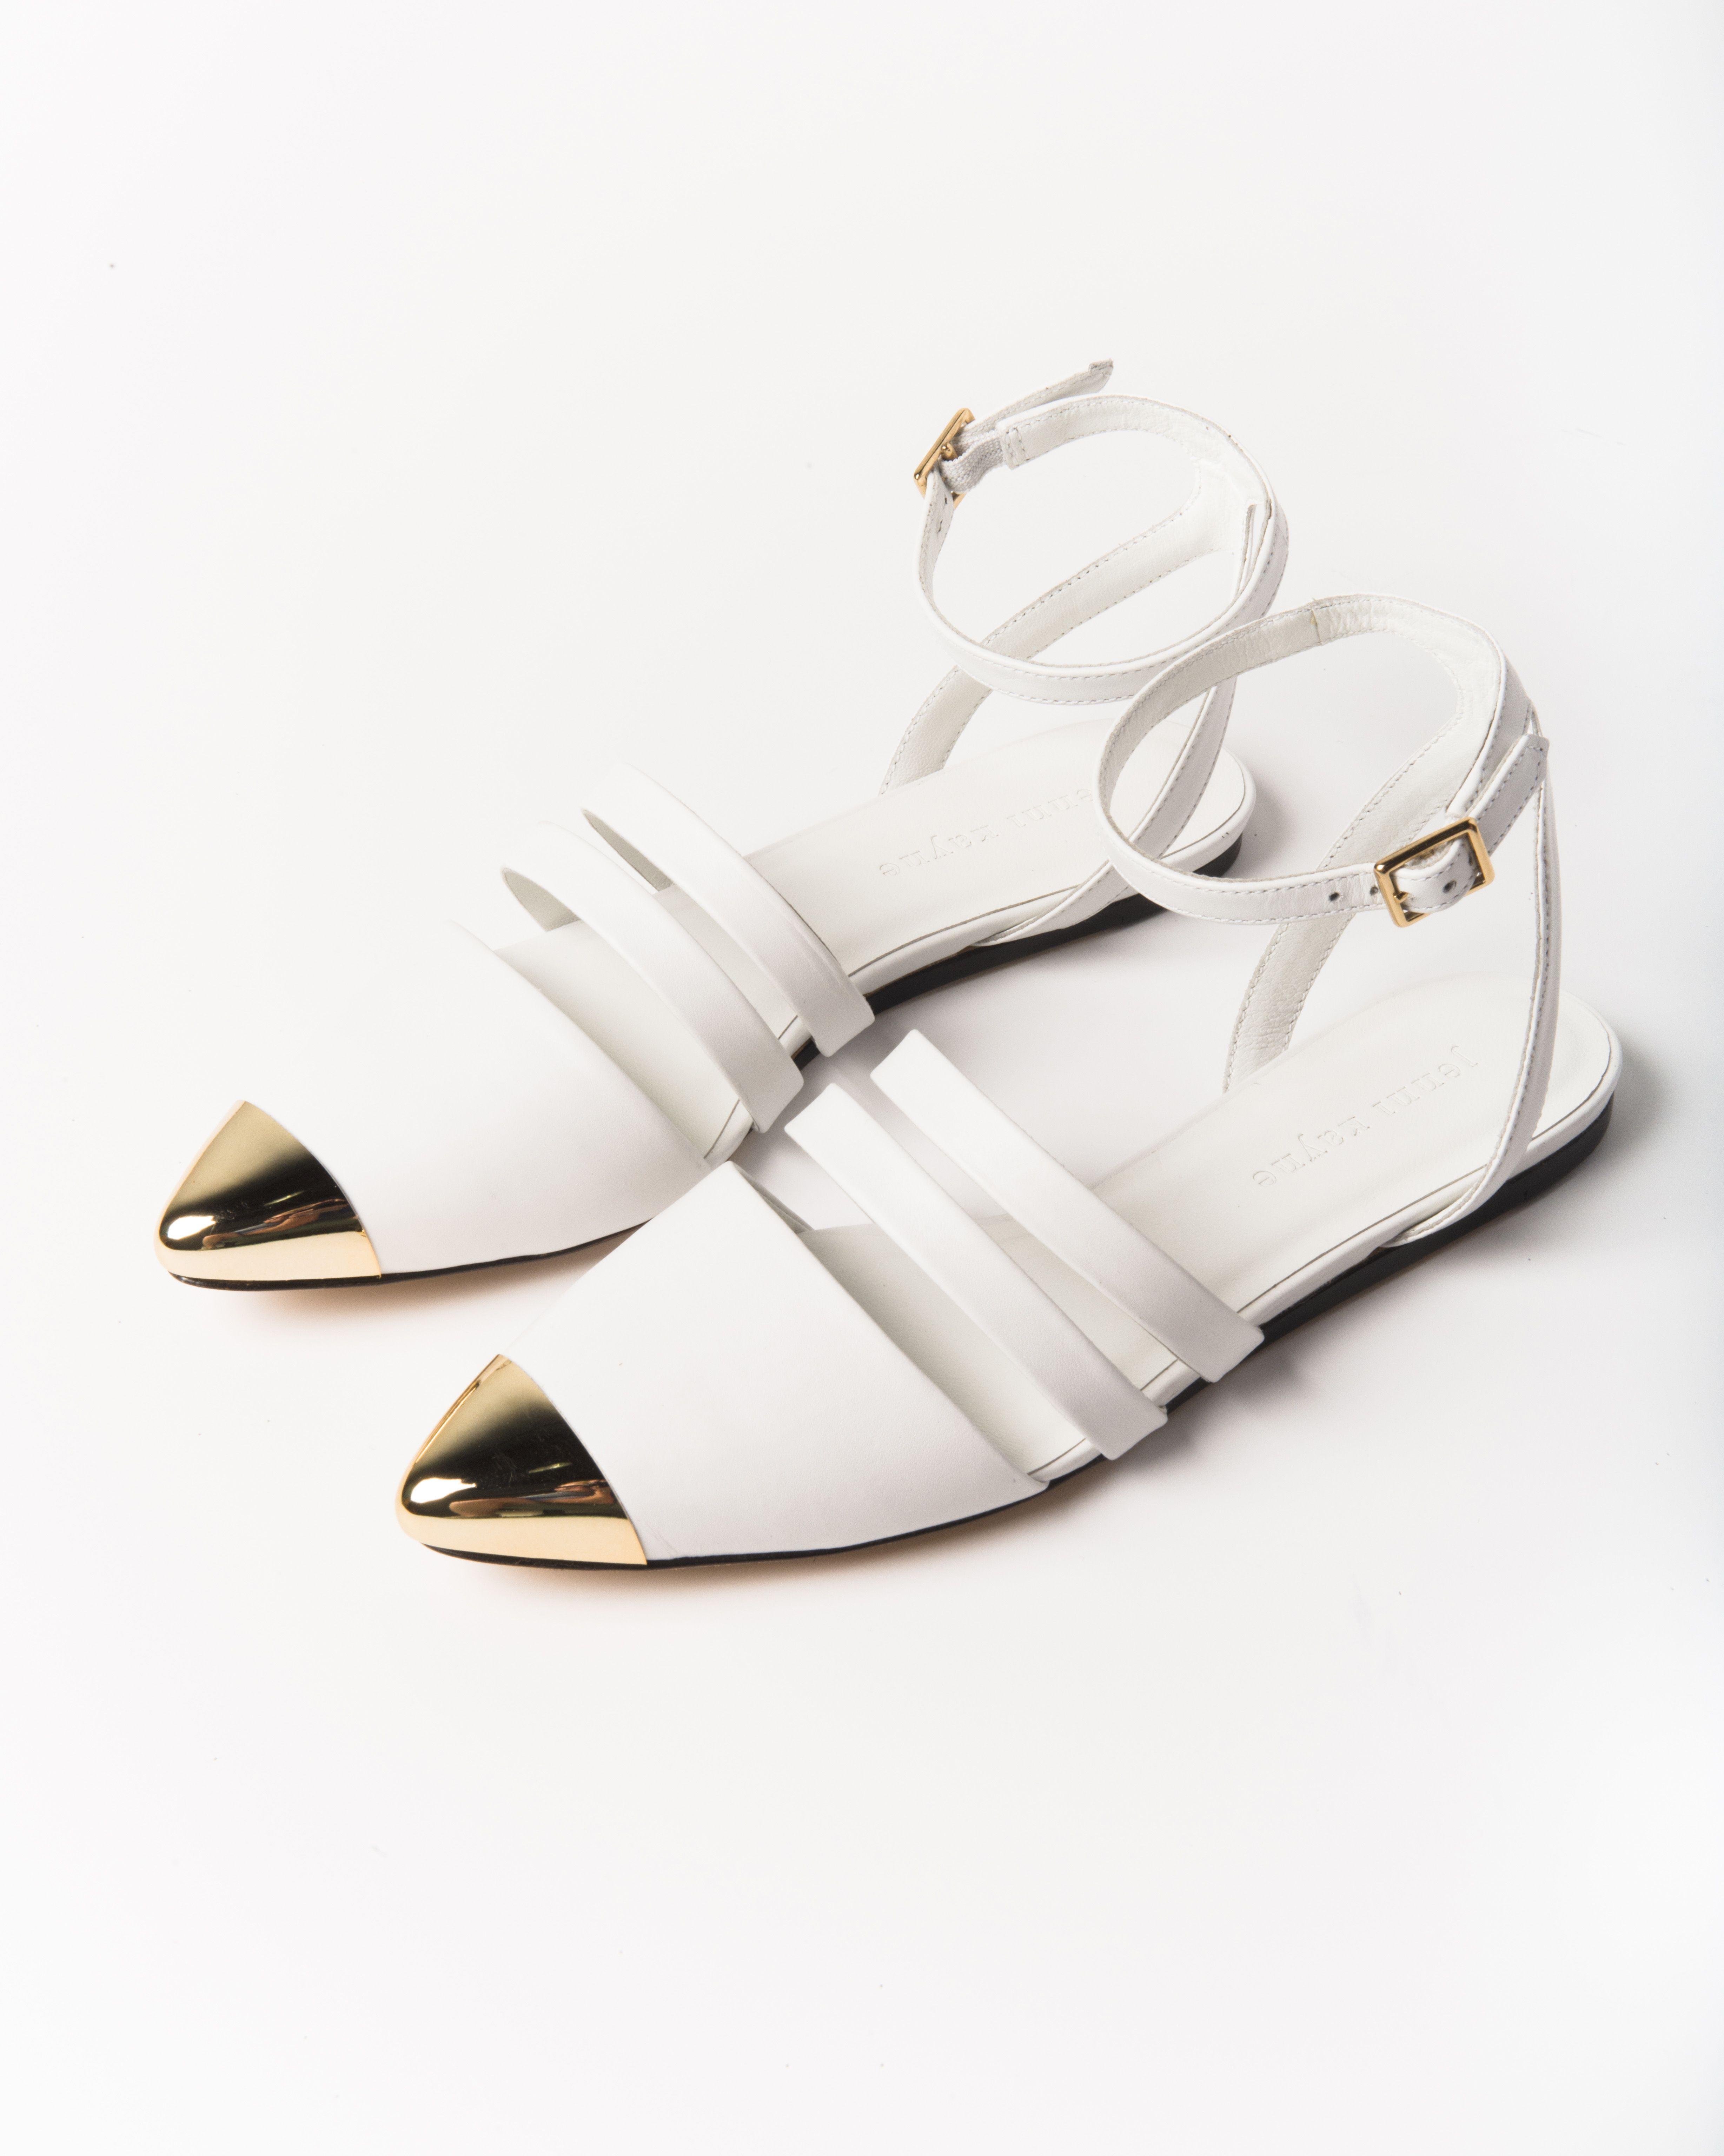 8bfe105cfbefd0 Street Smarts - Jenni Kayne strap sandals